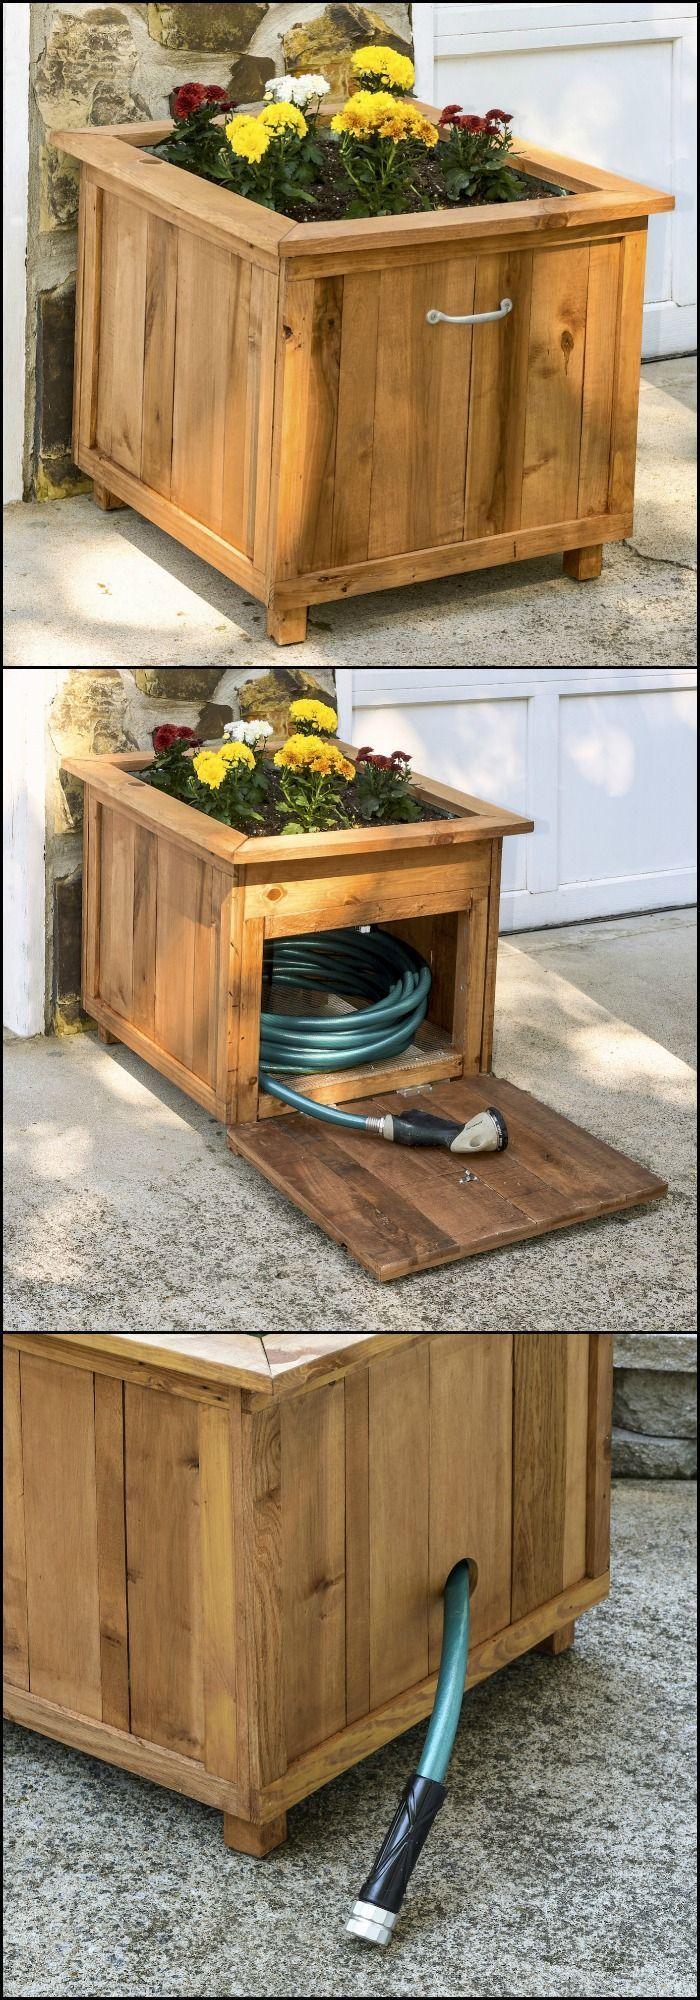 32 best Garden Hose plants - Gardening Techniques images on ...